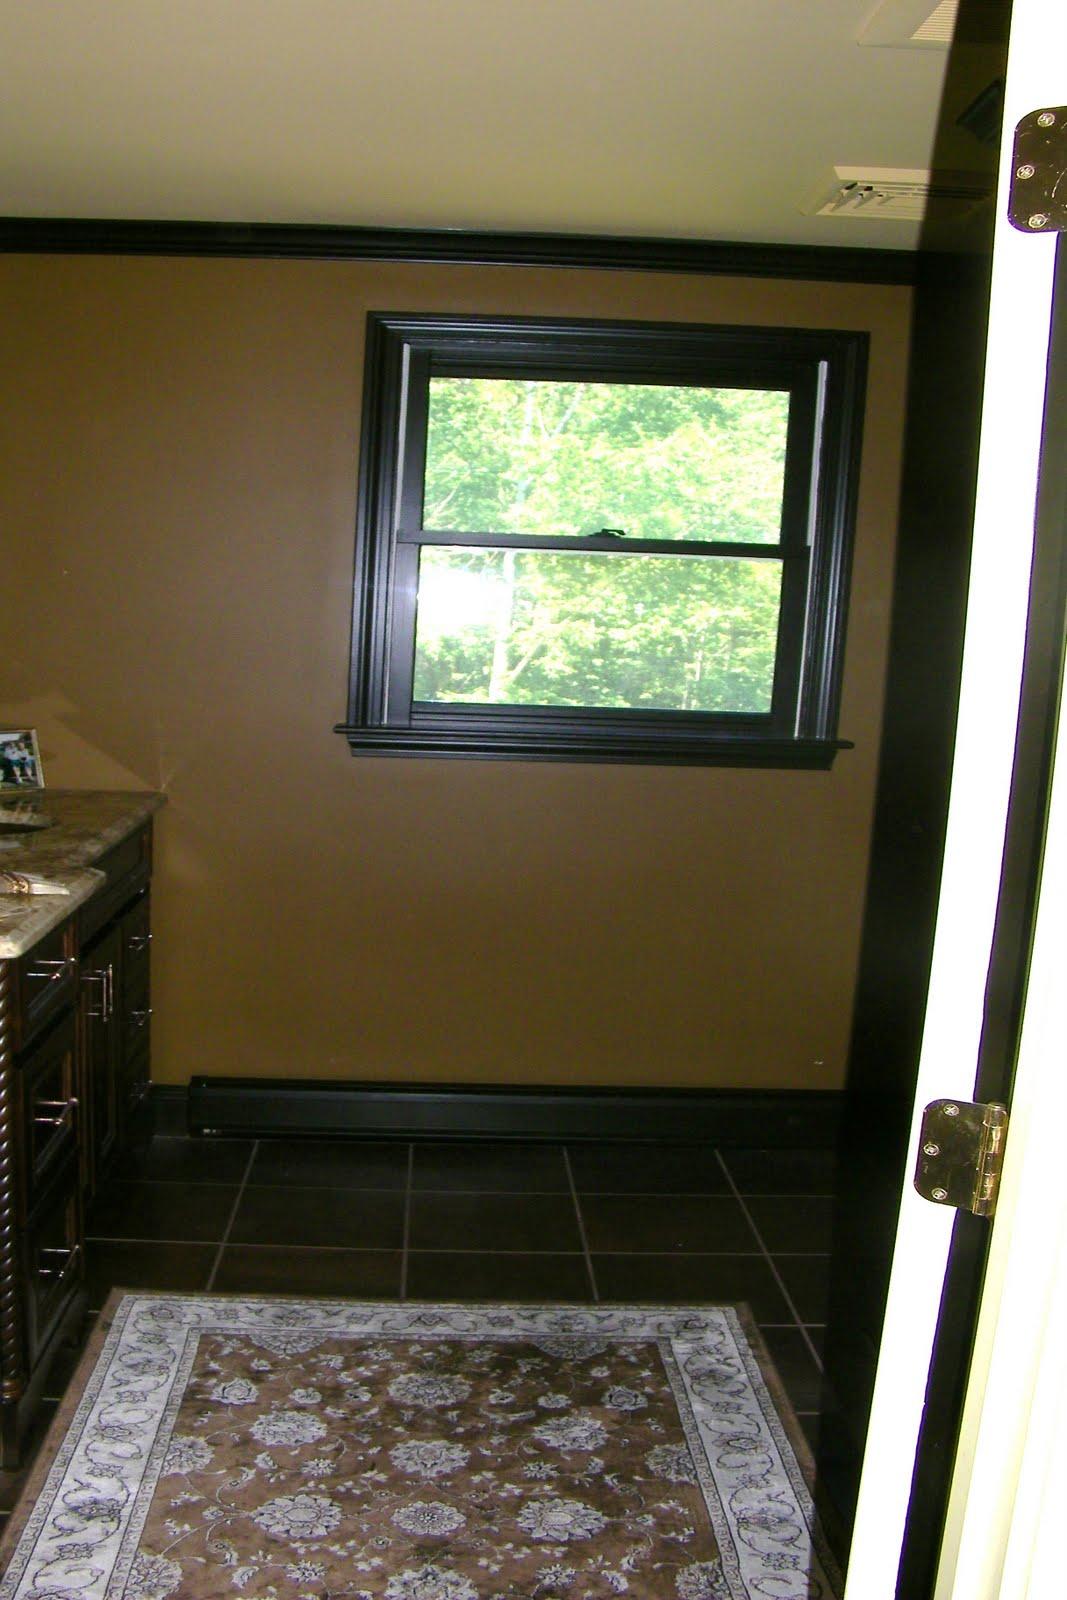 Maison decor grand treatments for small windows - Treatments for small windows ...